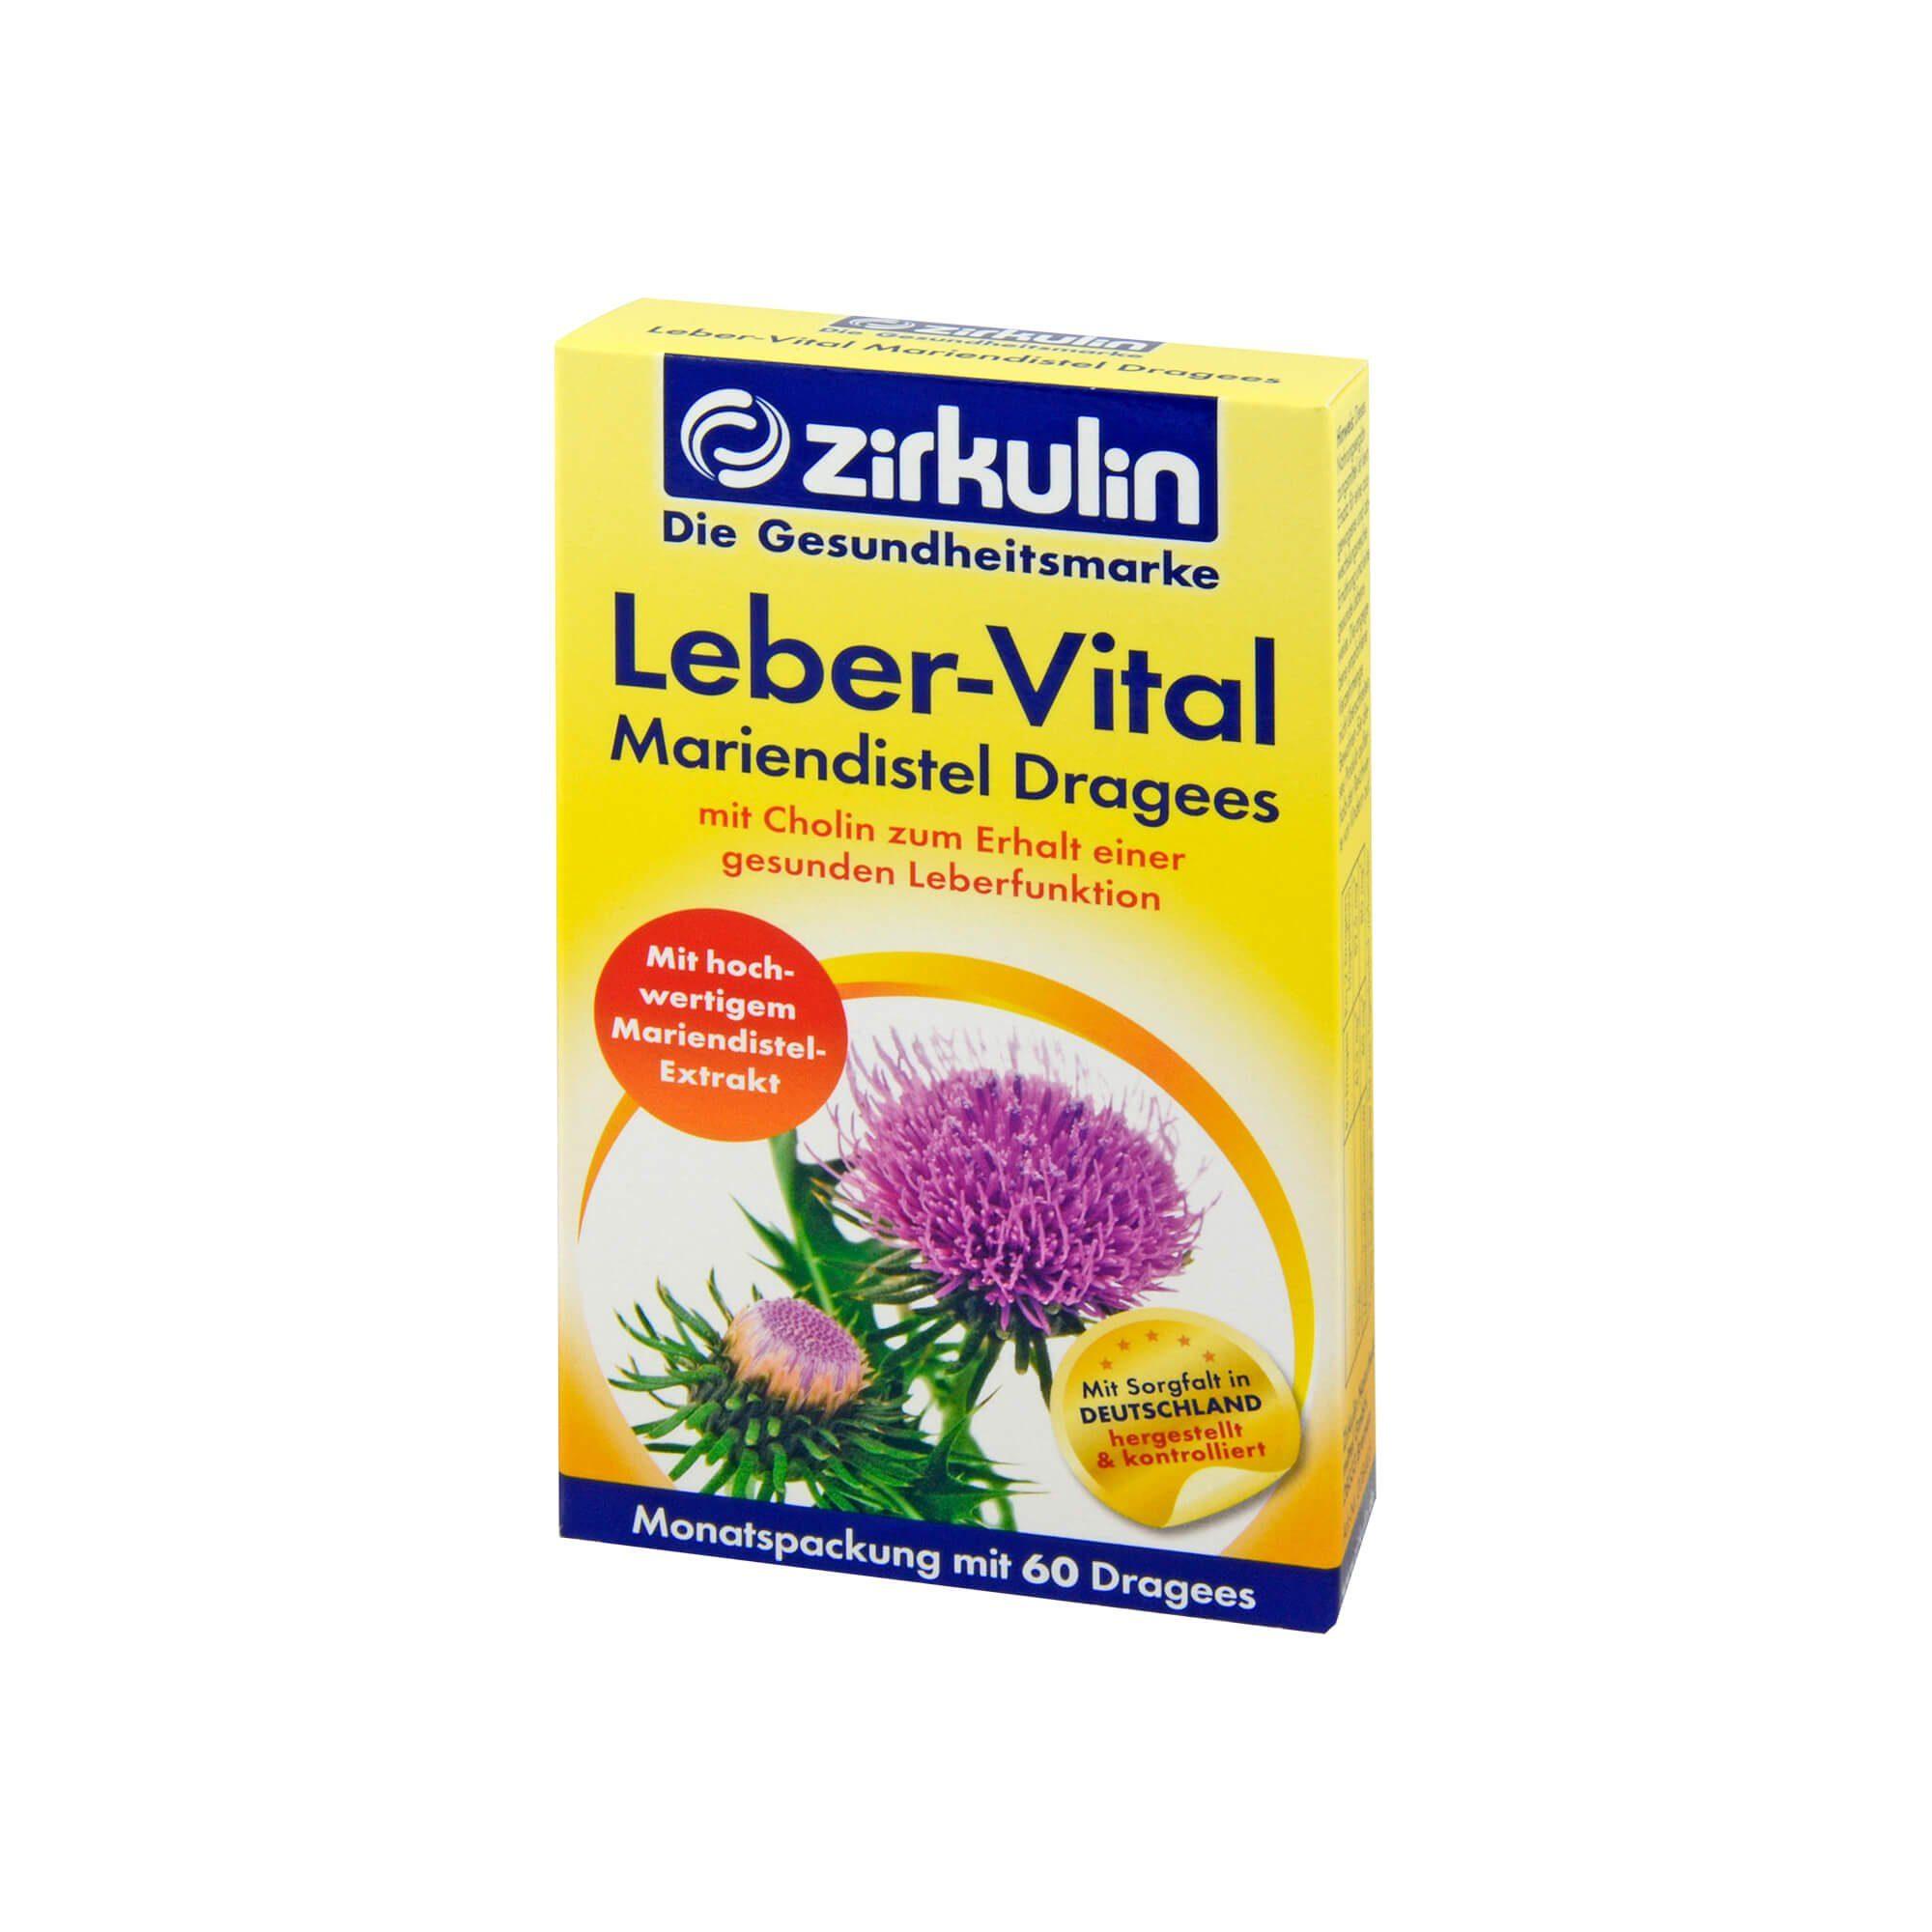 Zirkulin Leber-Vital Mariendistel Dragees, 60 St